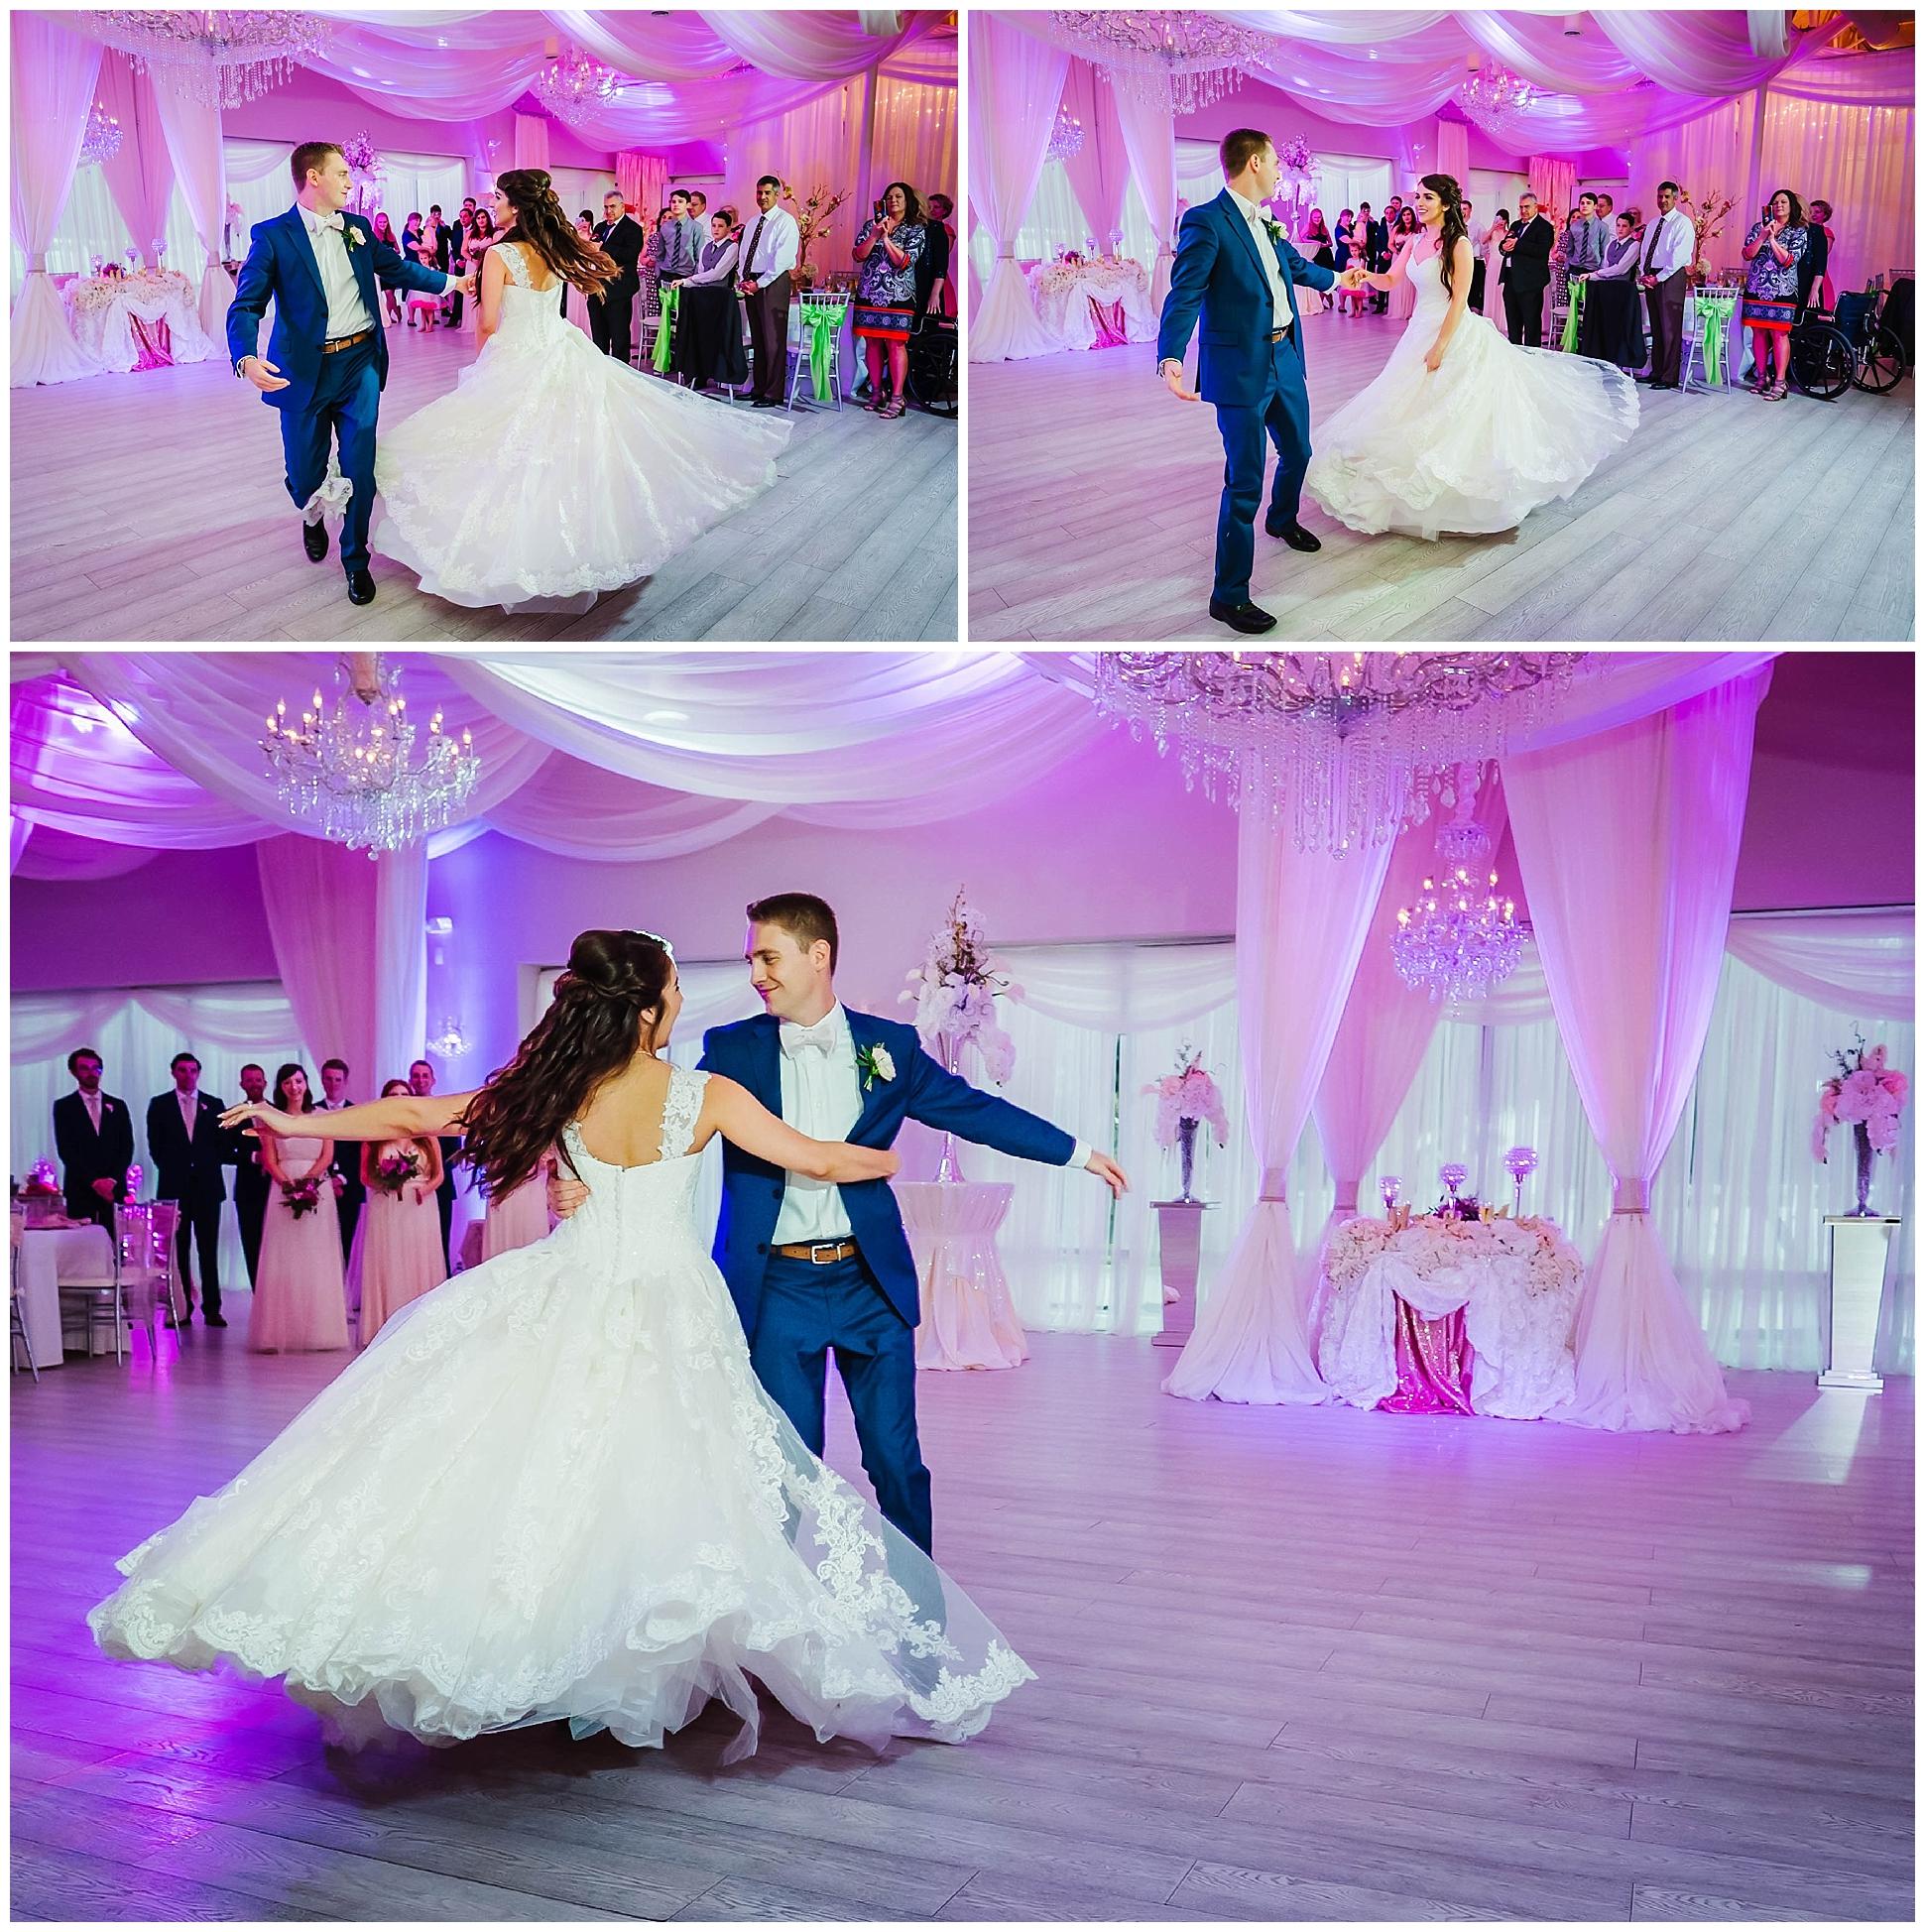 st-pete-wedding-photographer-sunken-gardens-crystal-ballroom-princess-dancer_0189.jpg